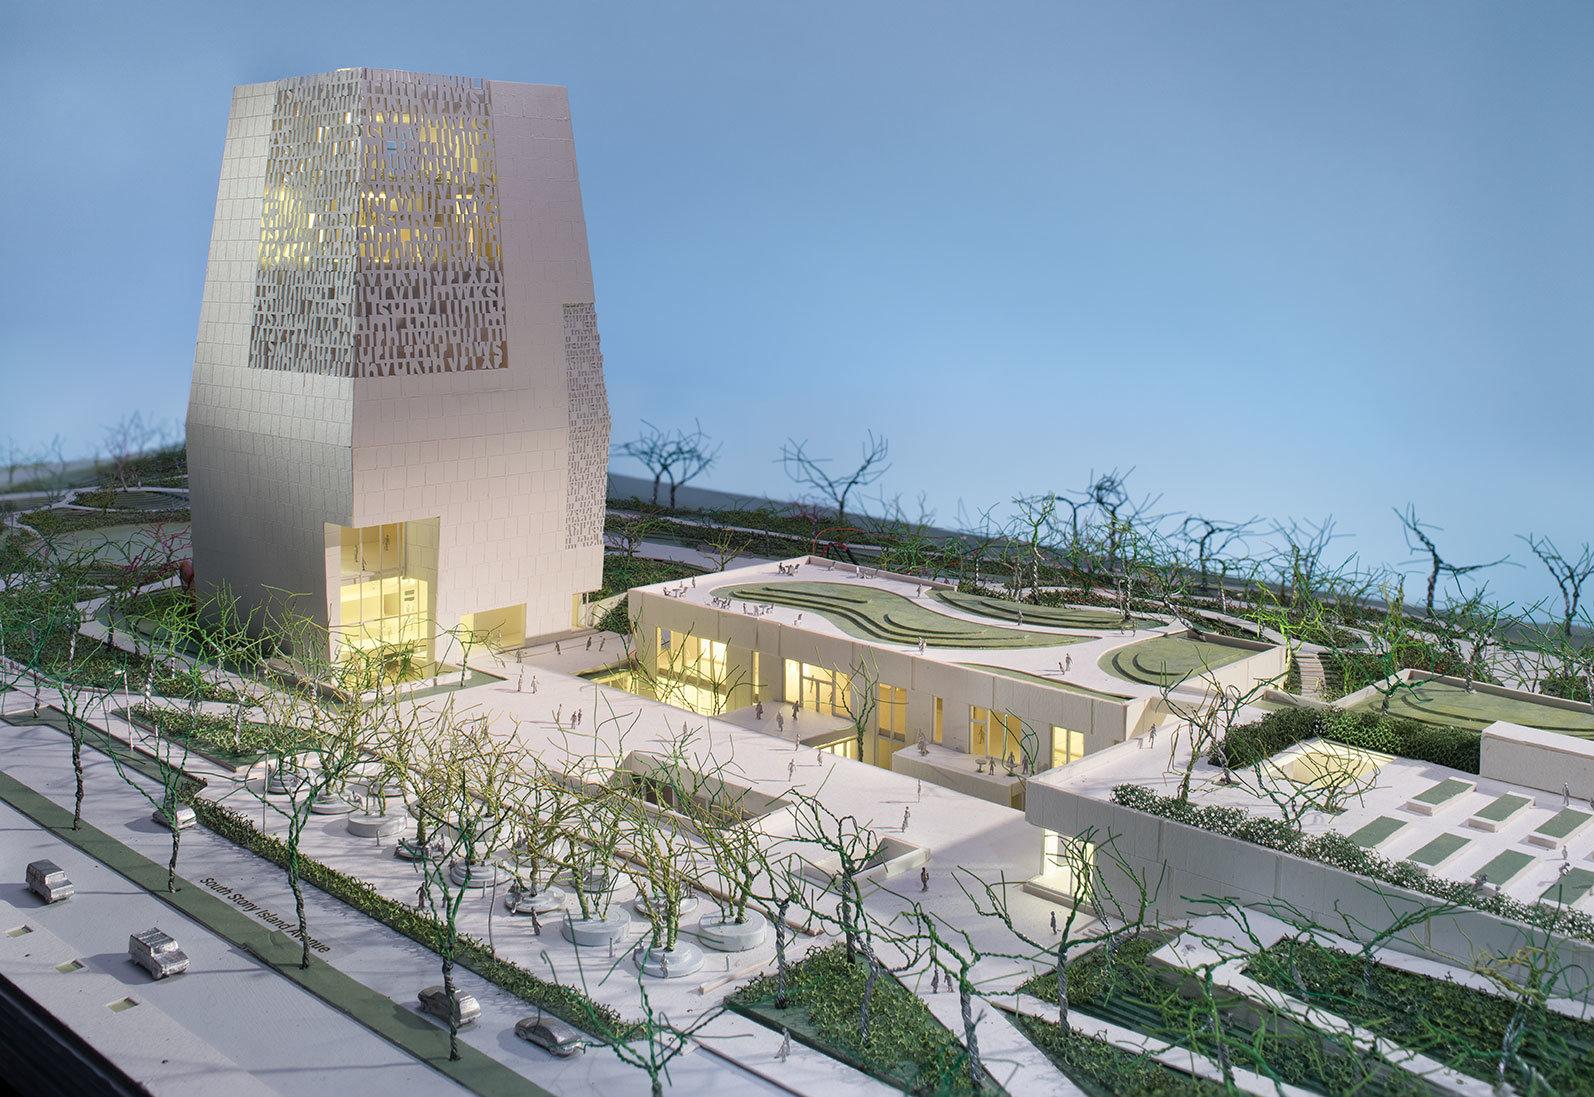 Obama Library   UNREDACTED